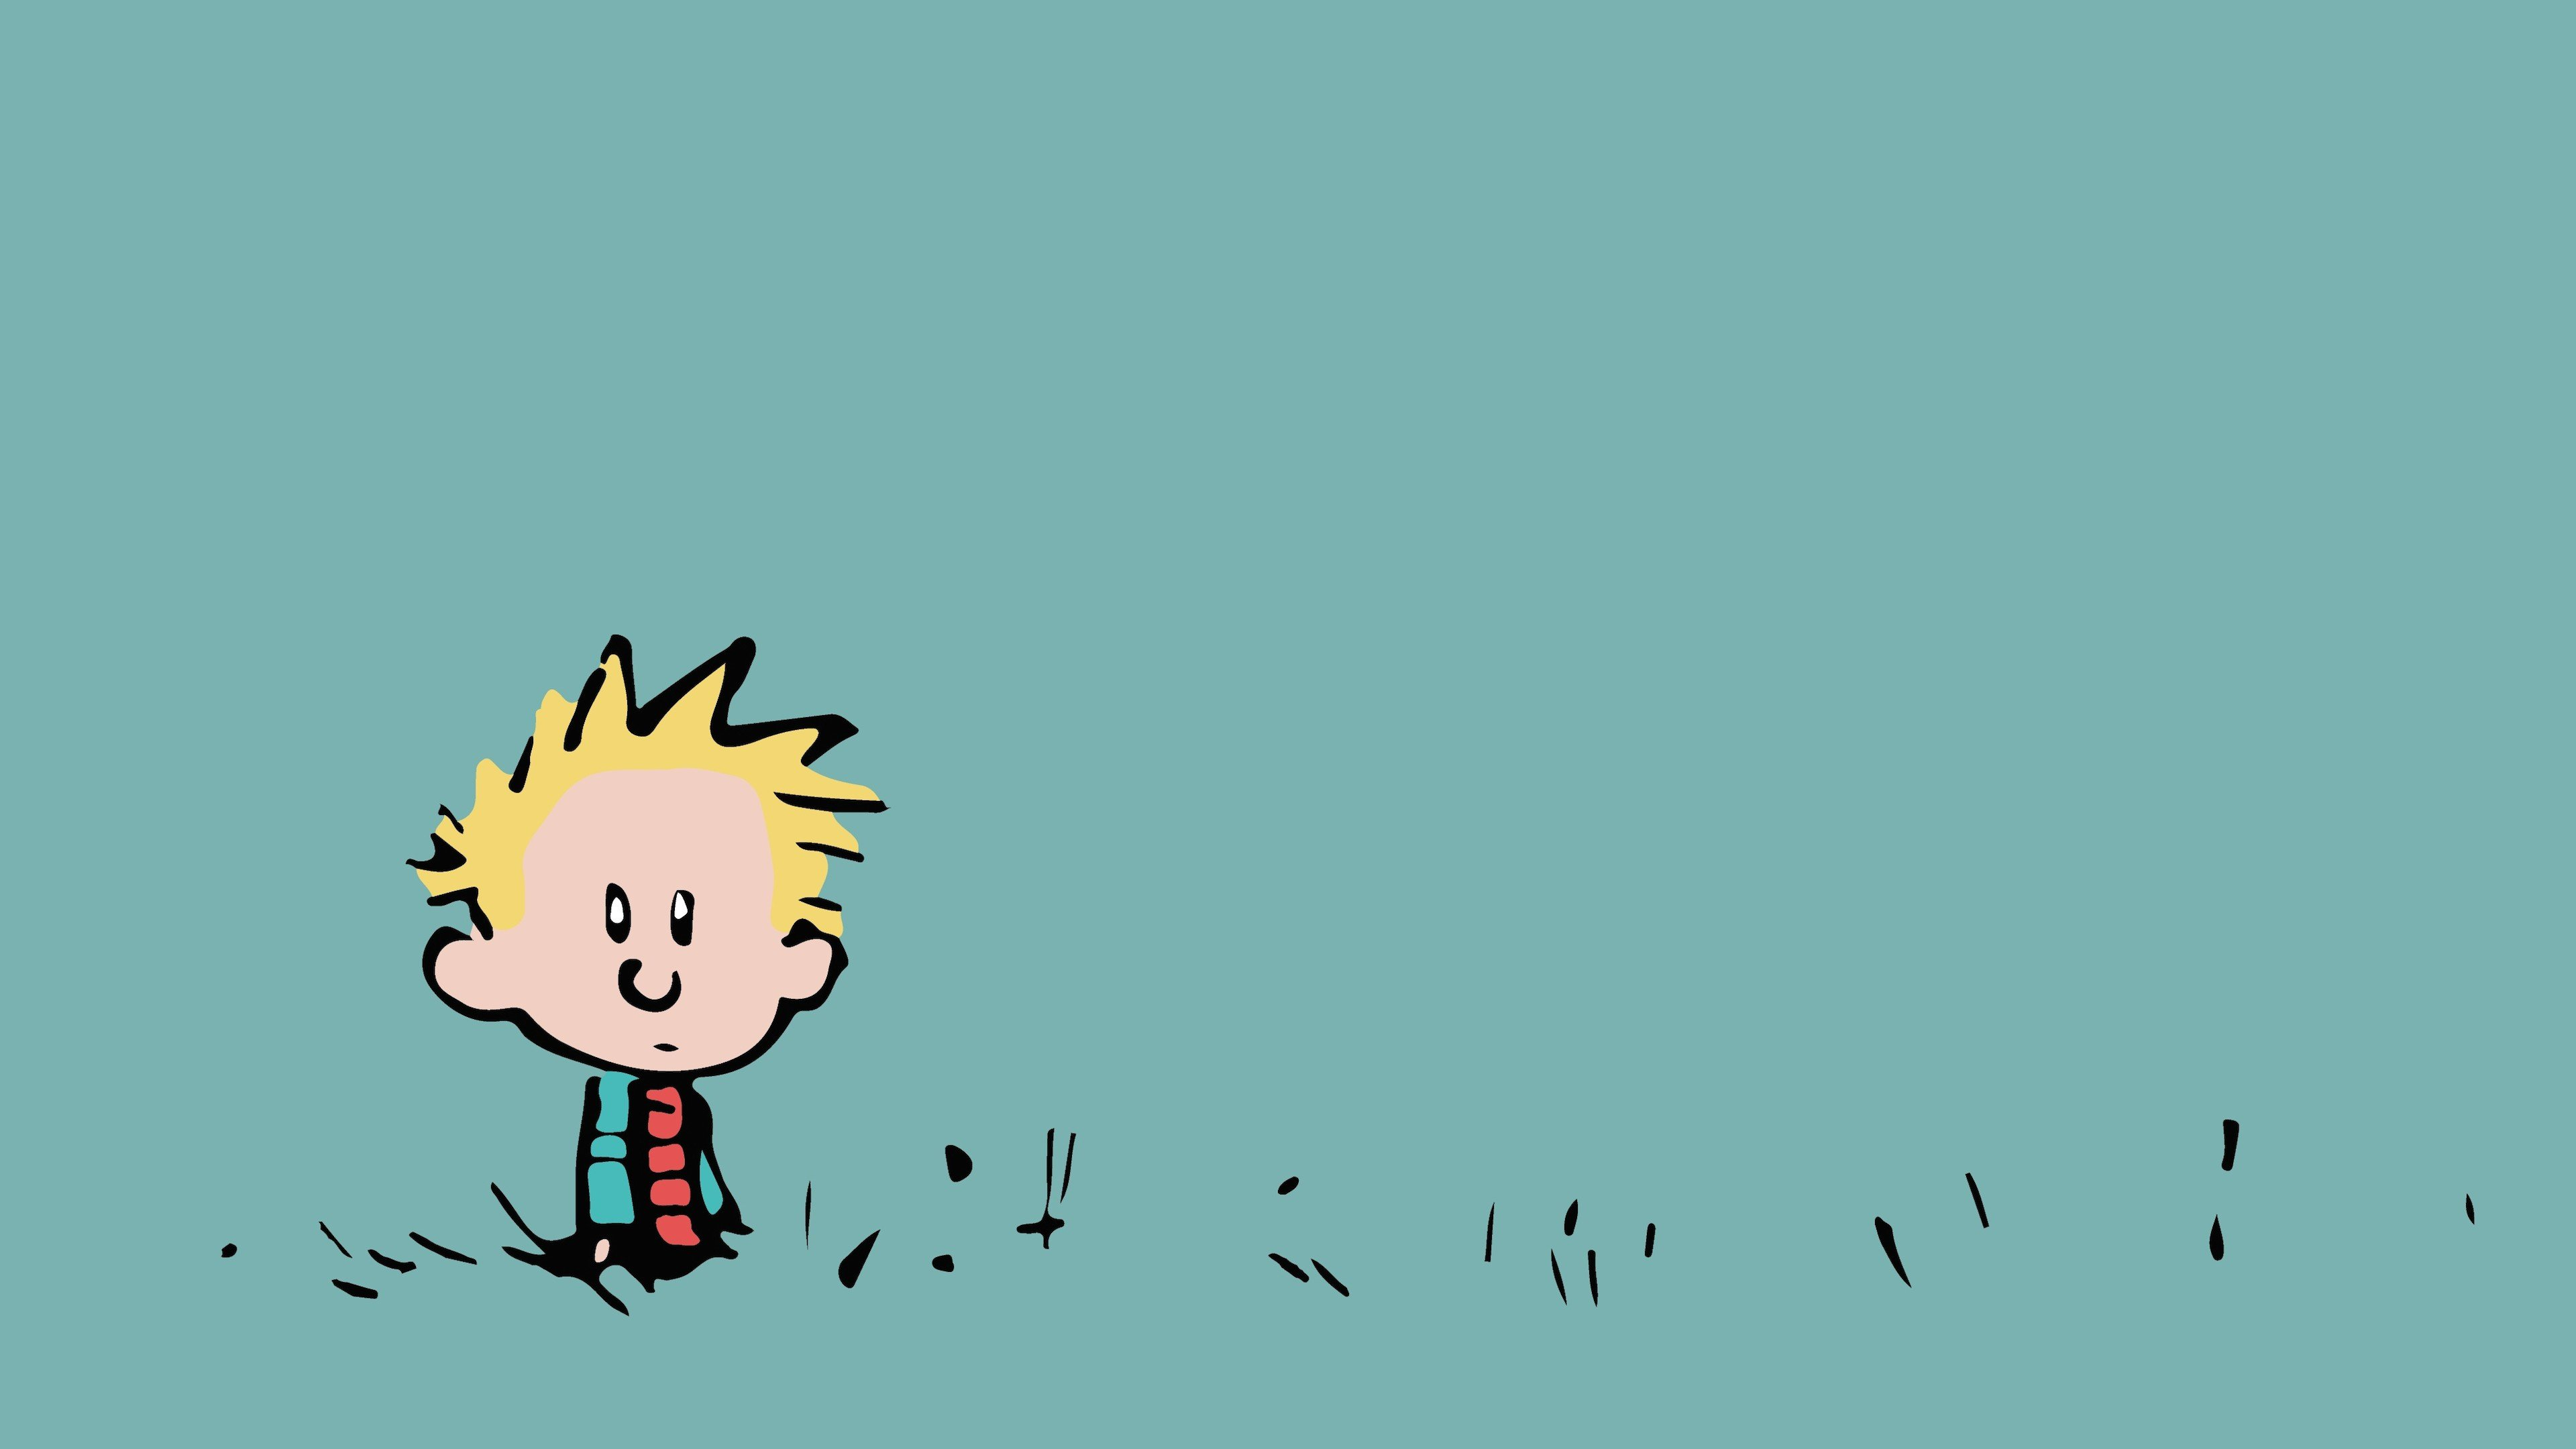 Calvin And Hobbes Wallpapers 3840x2160 Ultra Hd 4k Desktop Backgrounds